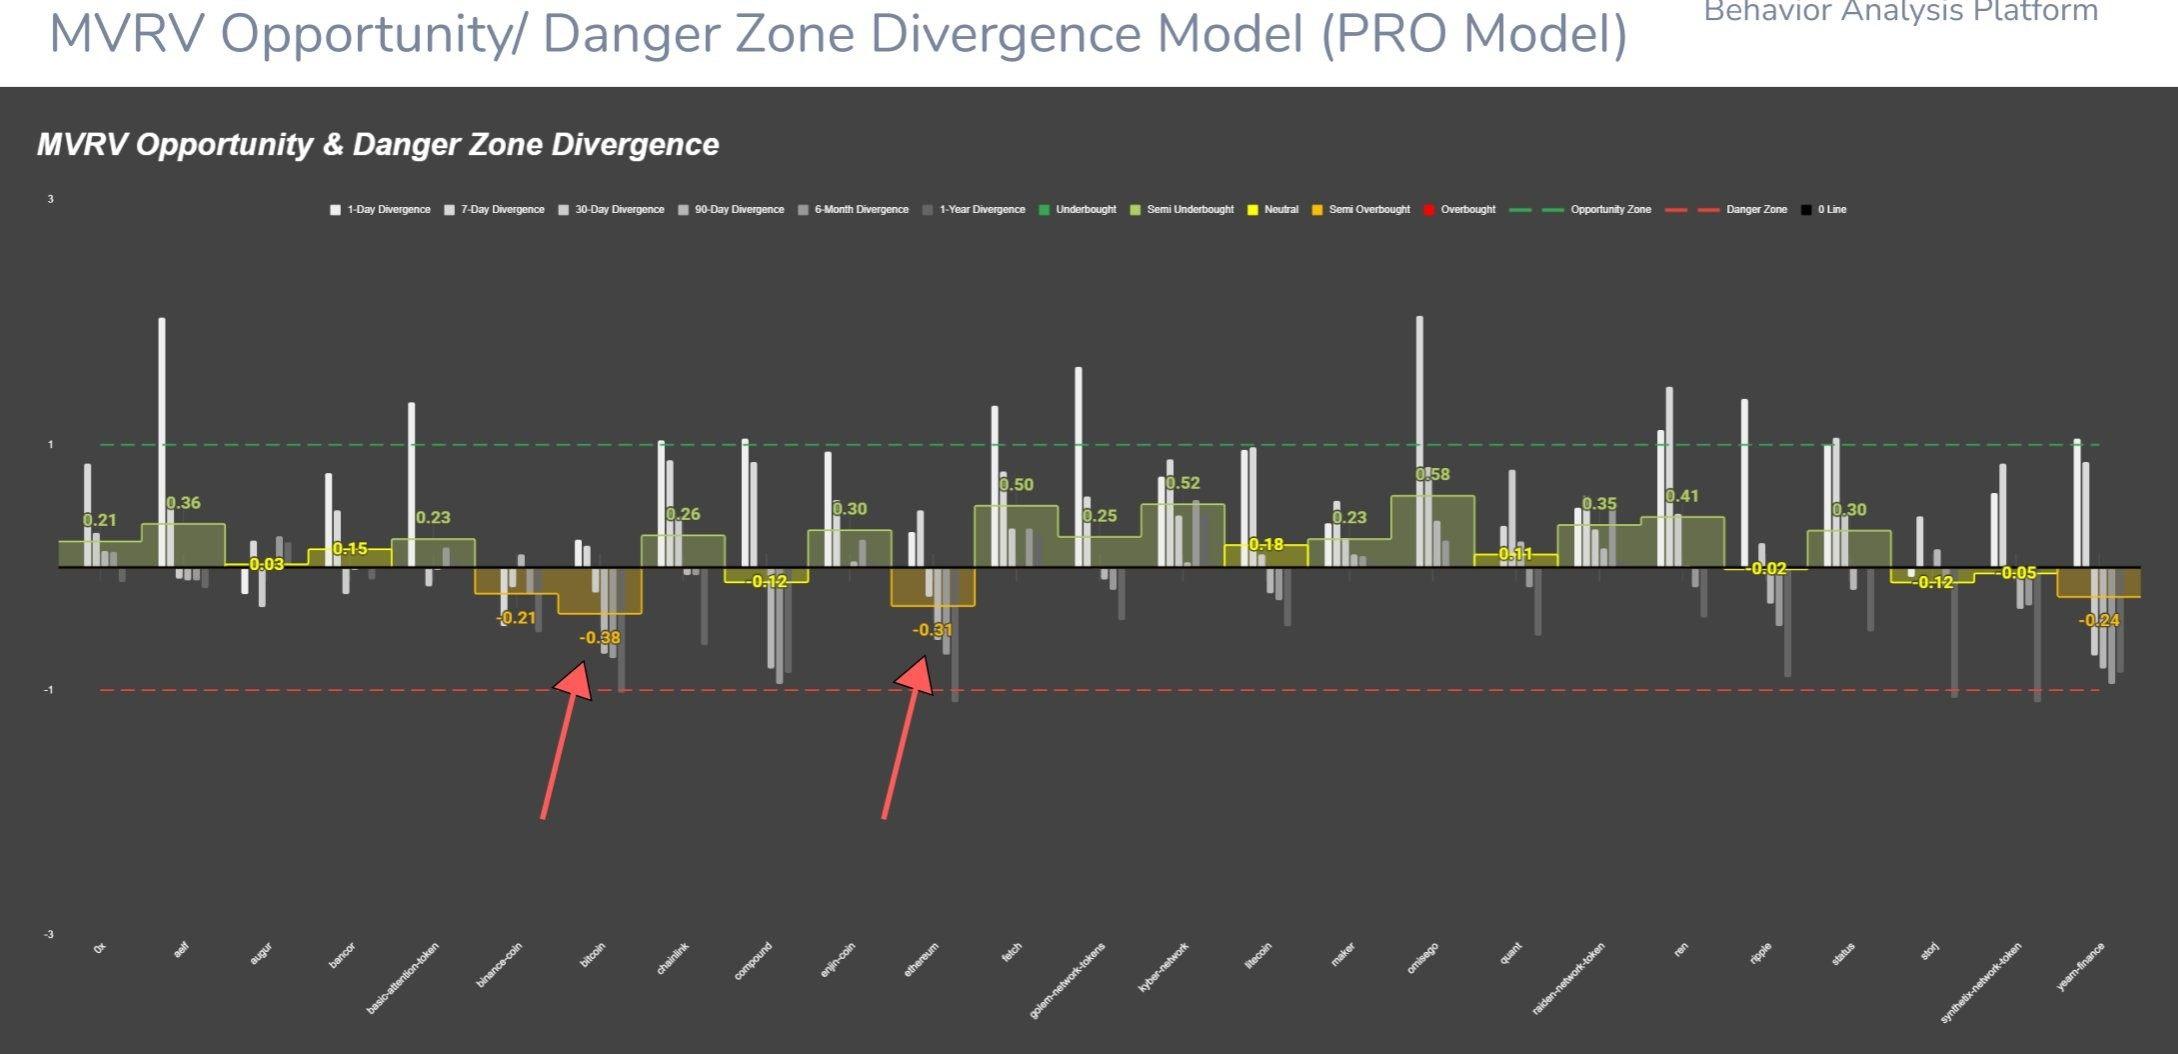 Bitcoin/ETH MVRV chart